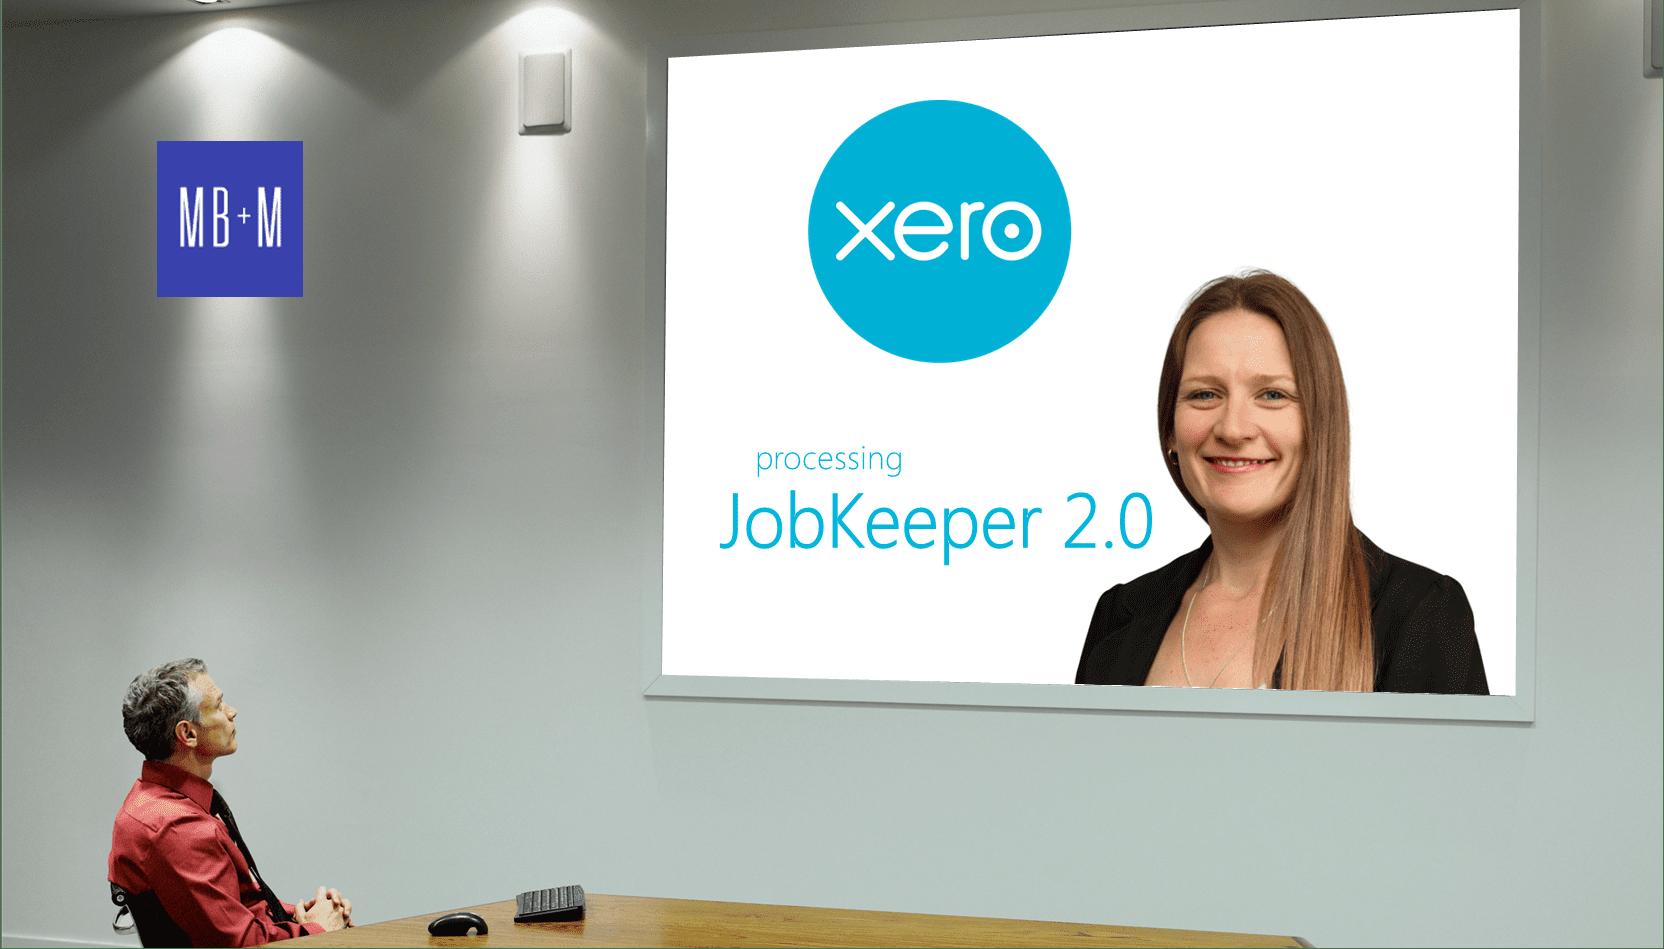 Xero & processing JobKeeper 2.0